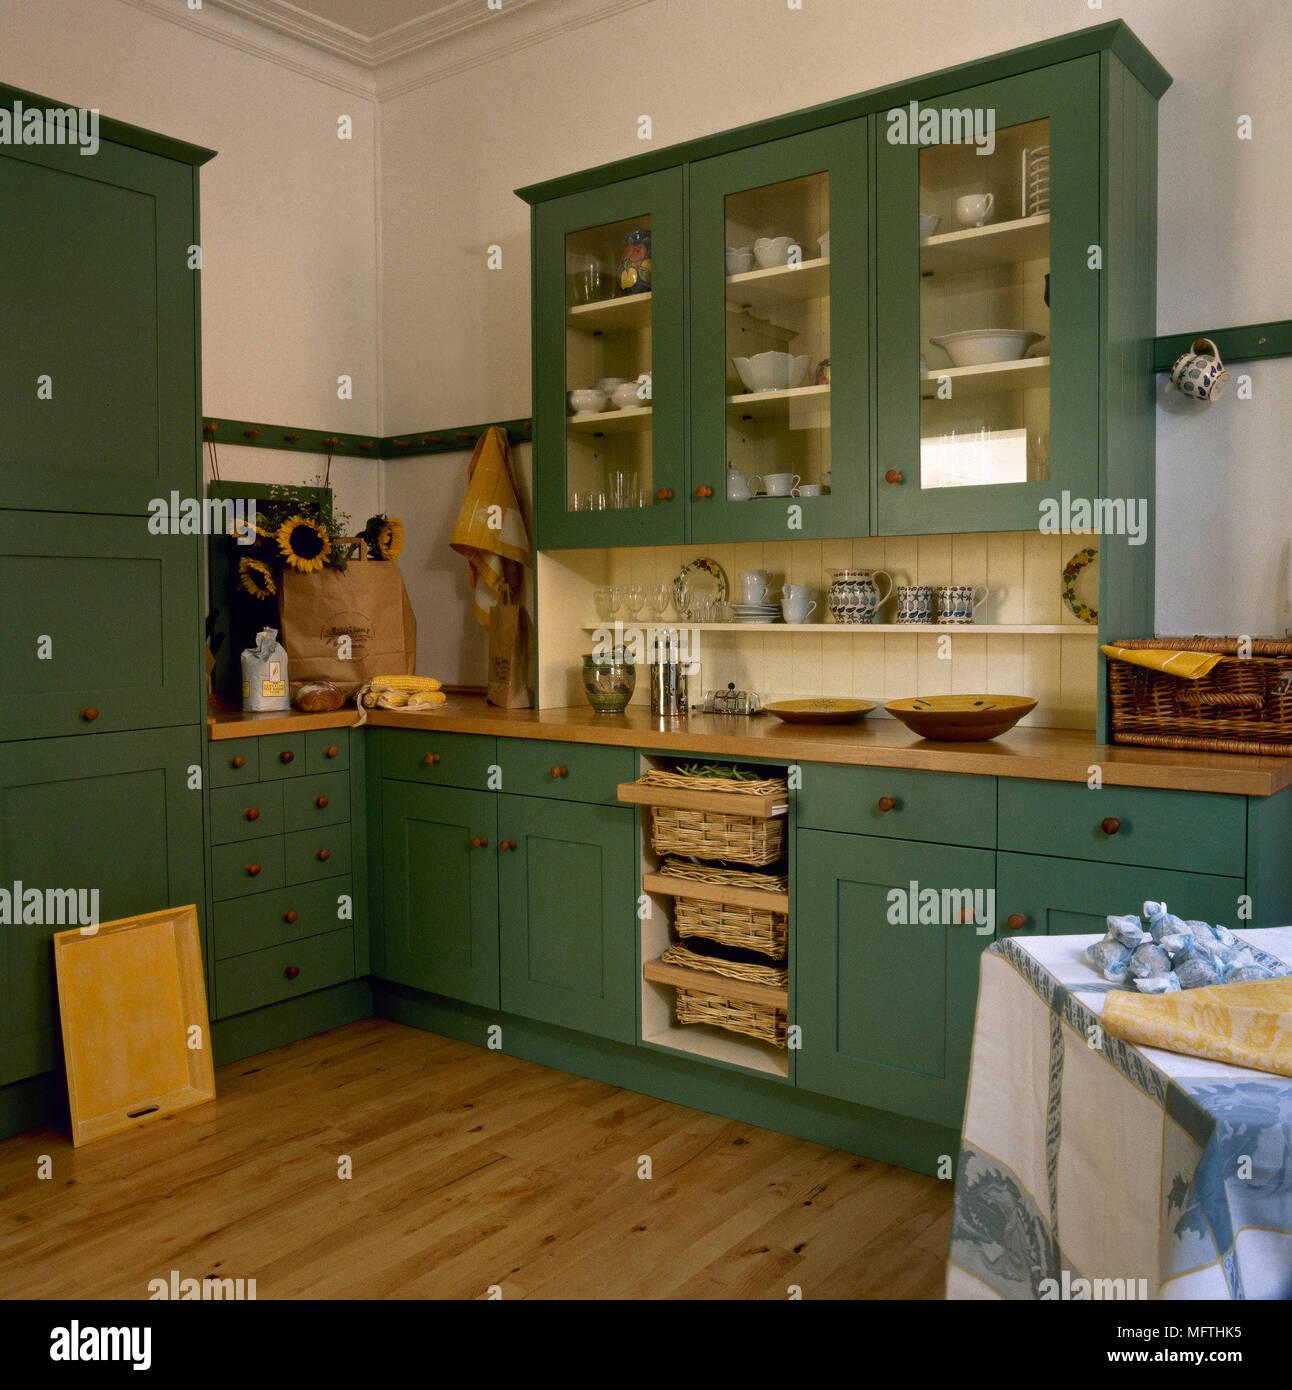 Moderno e in stile country con cucina dipinte di verde armadi e ...